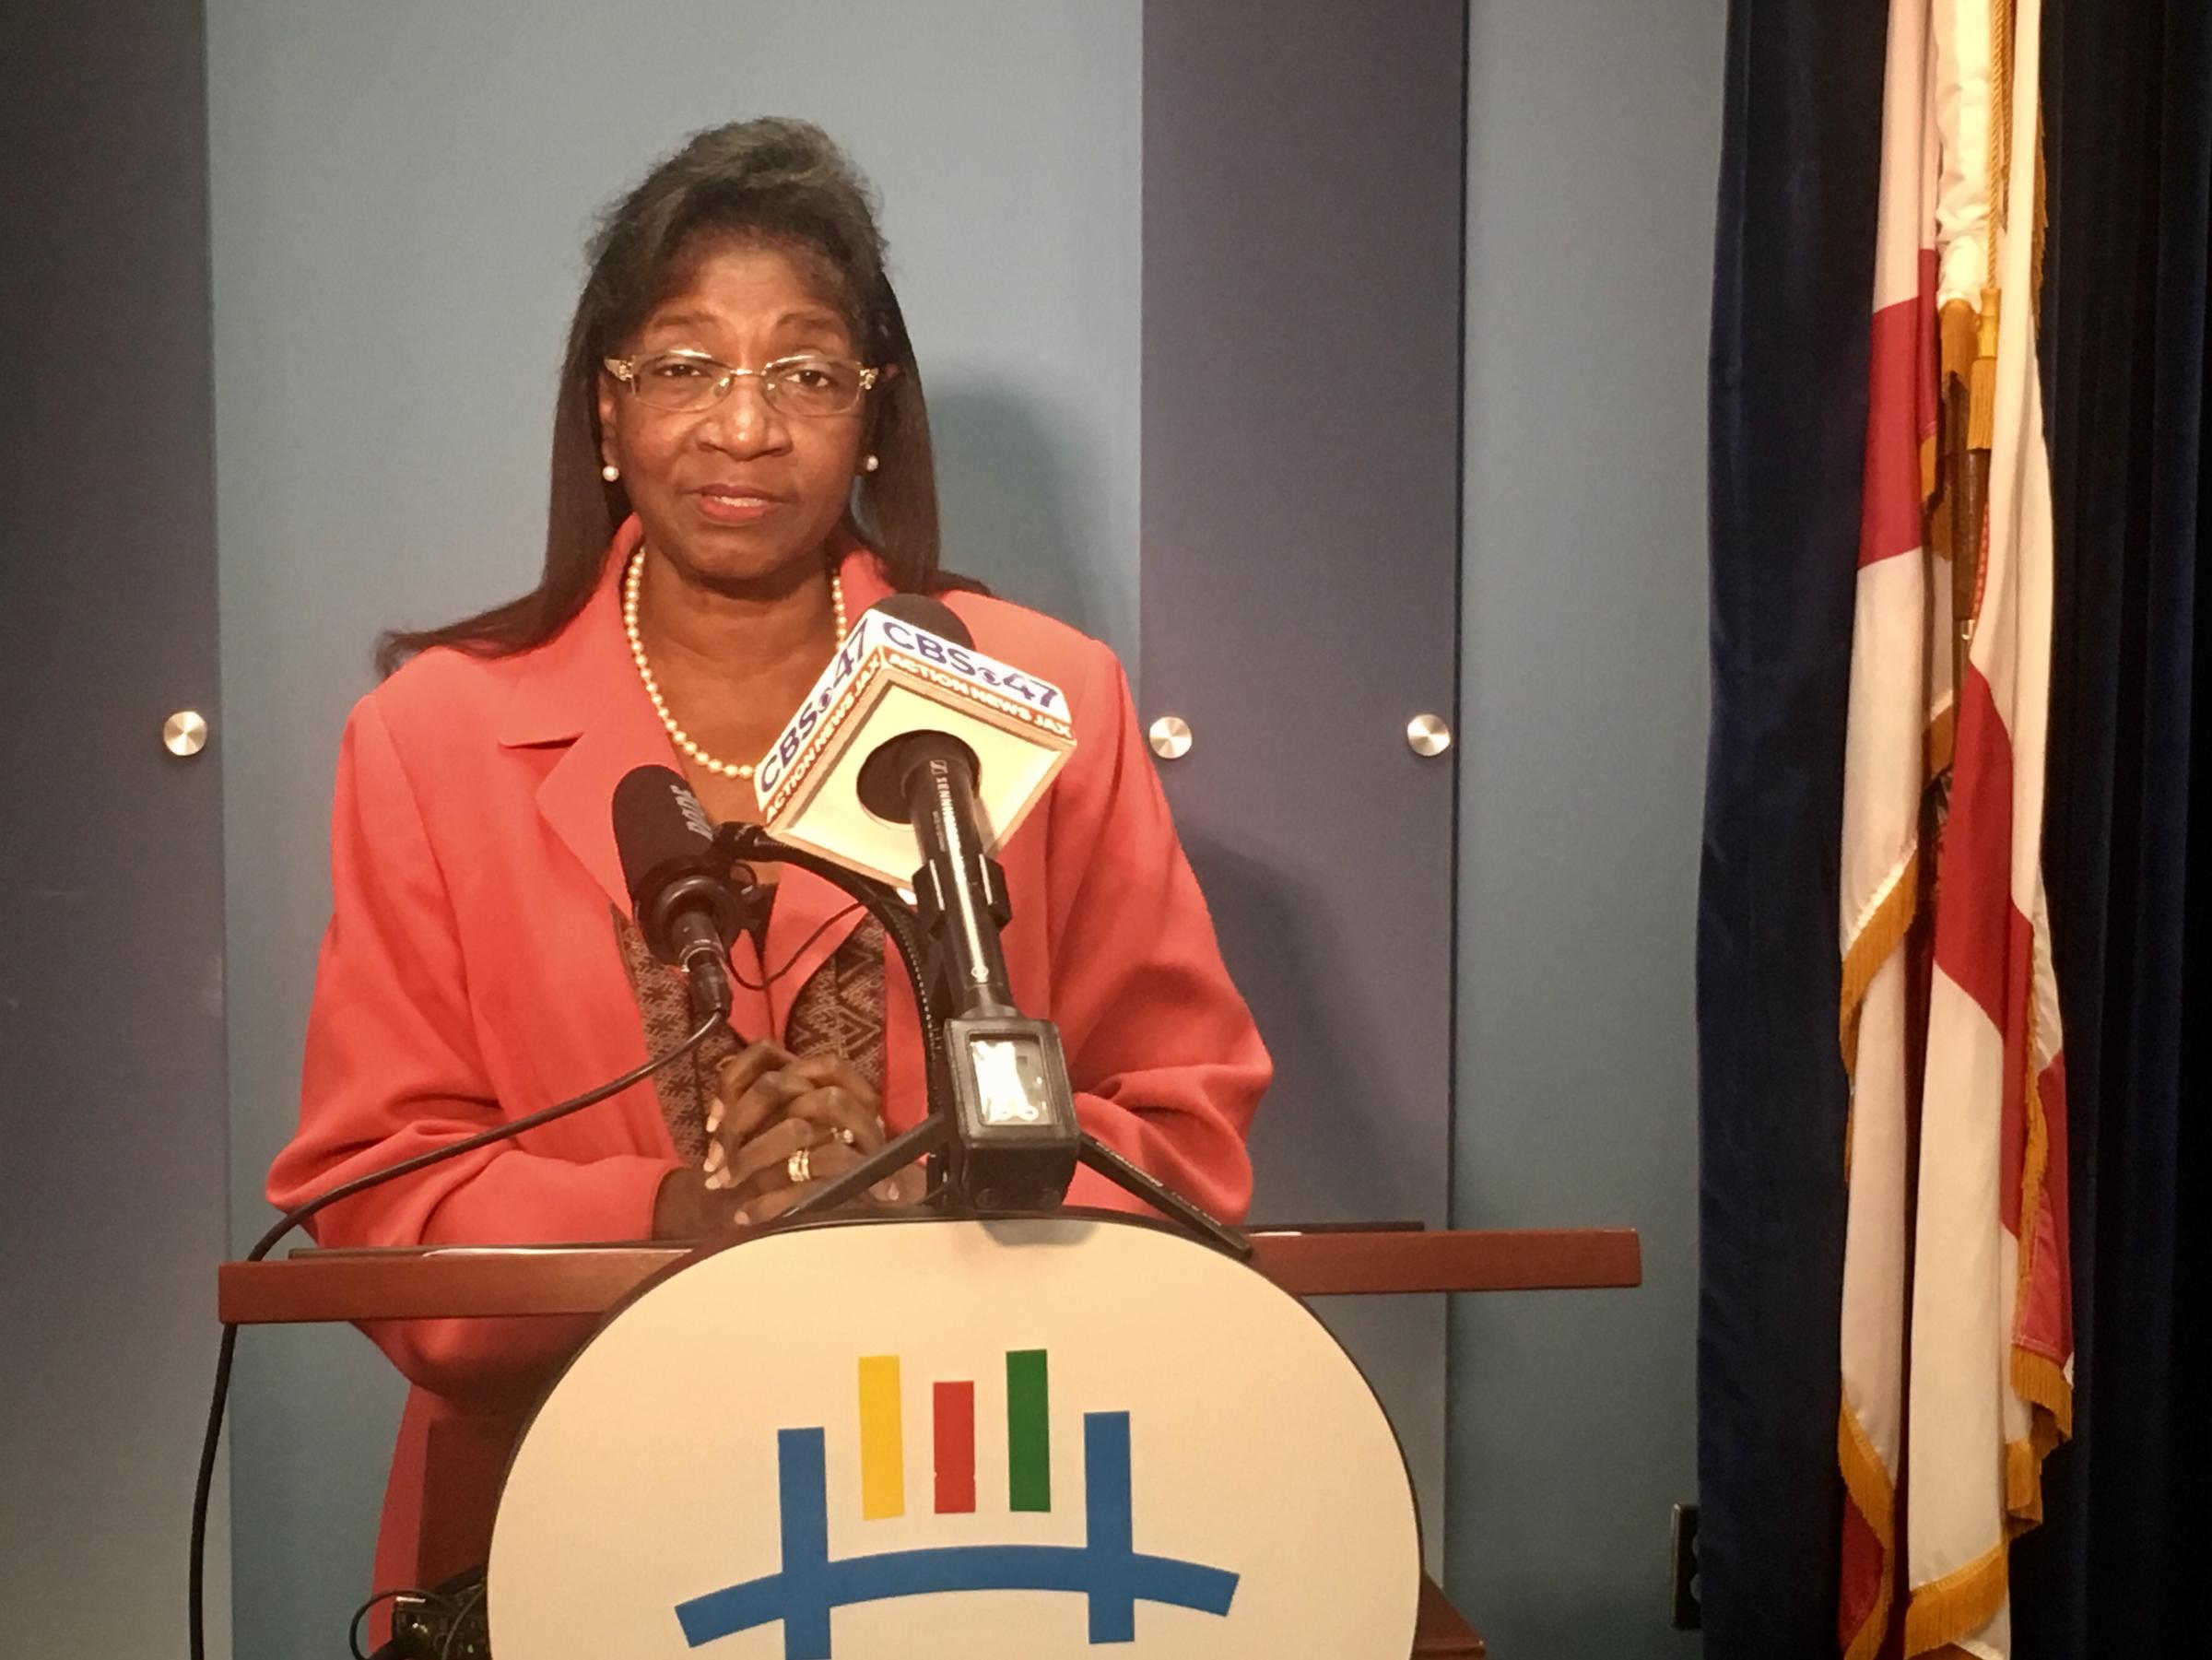 Florida school grades released